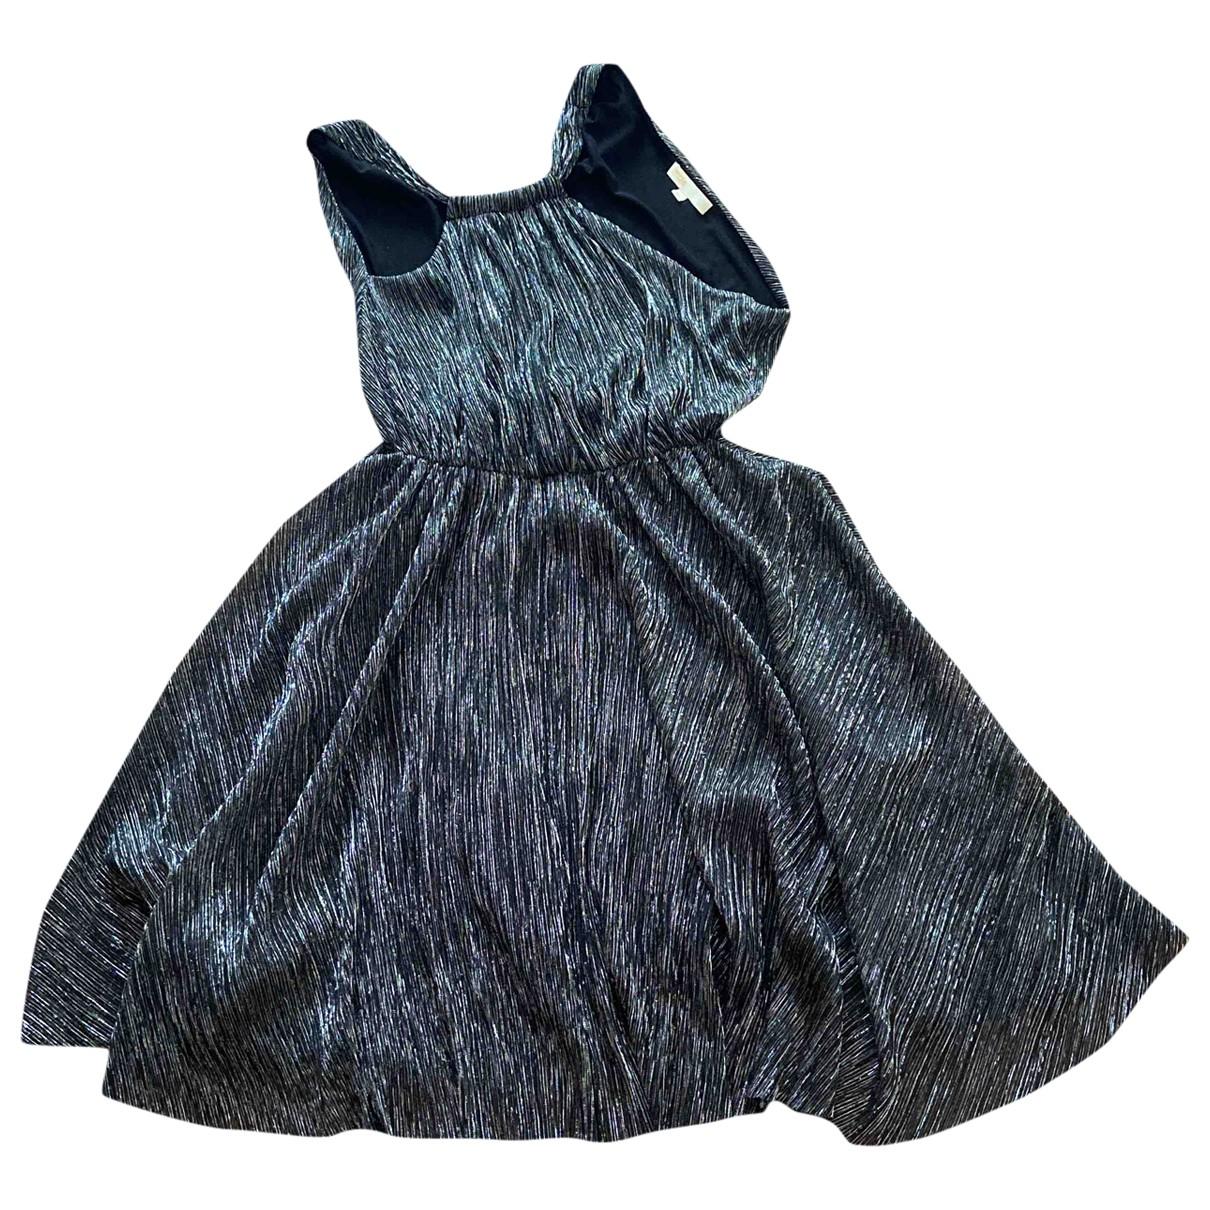 Maje Fall Winter 2019 Black dress for Women 34 FR